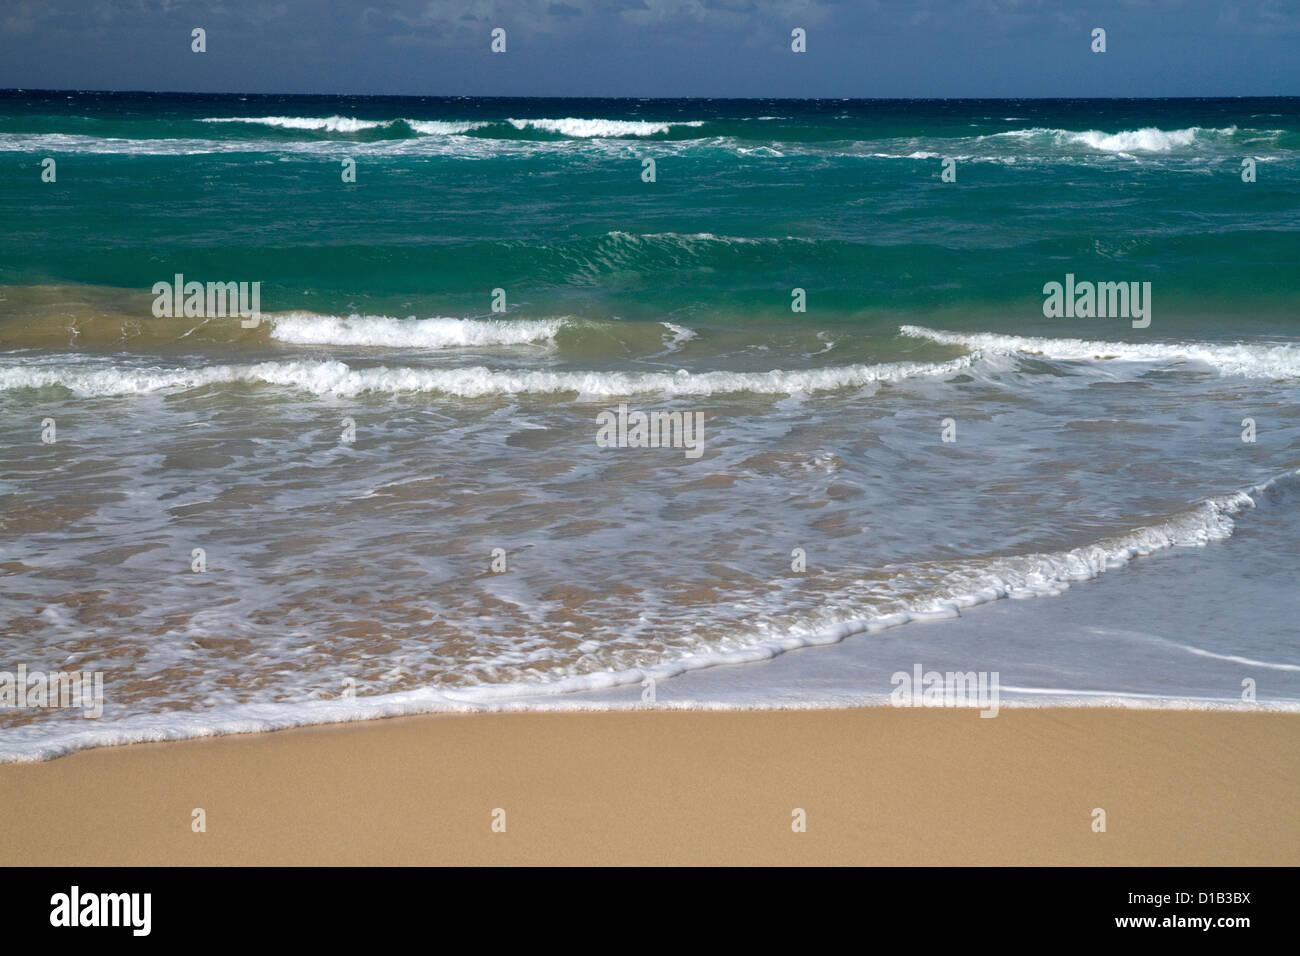 Polihale Beach and State Park located on the western side of the island of Kauai, Hawaii, USA. Stock Photo